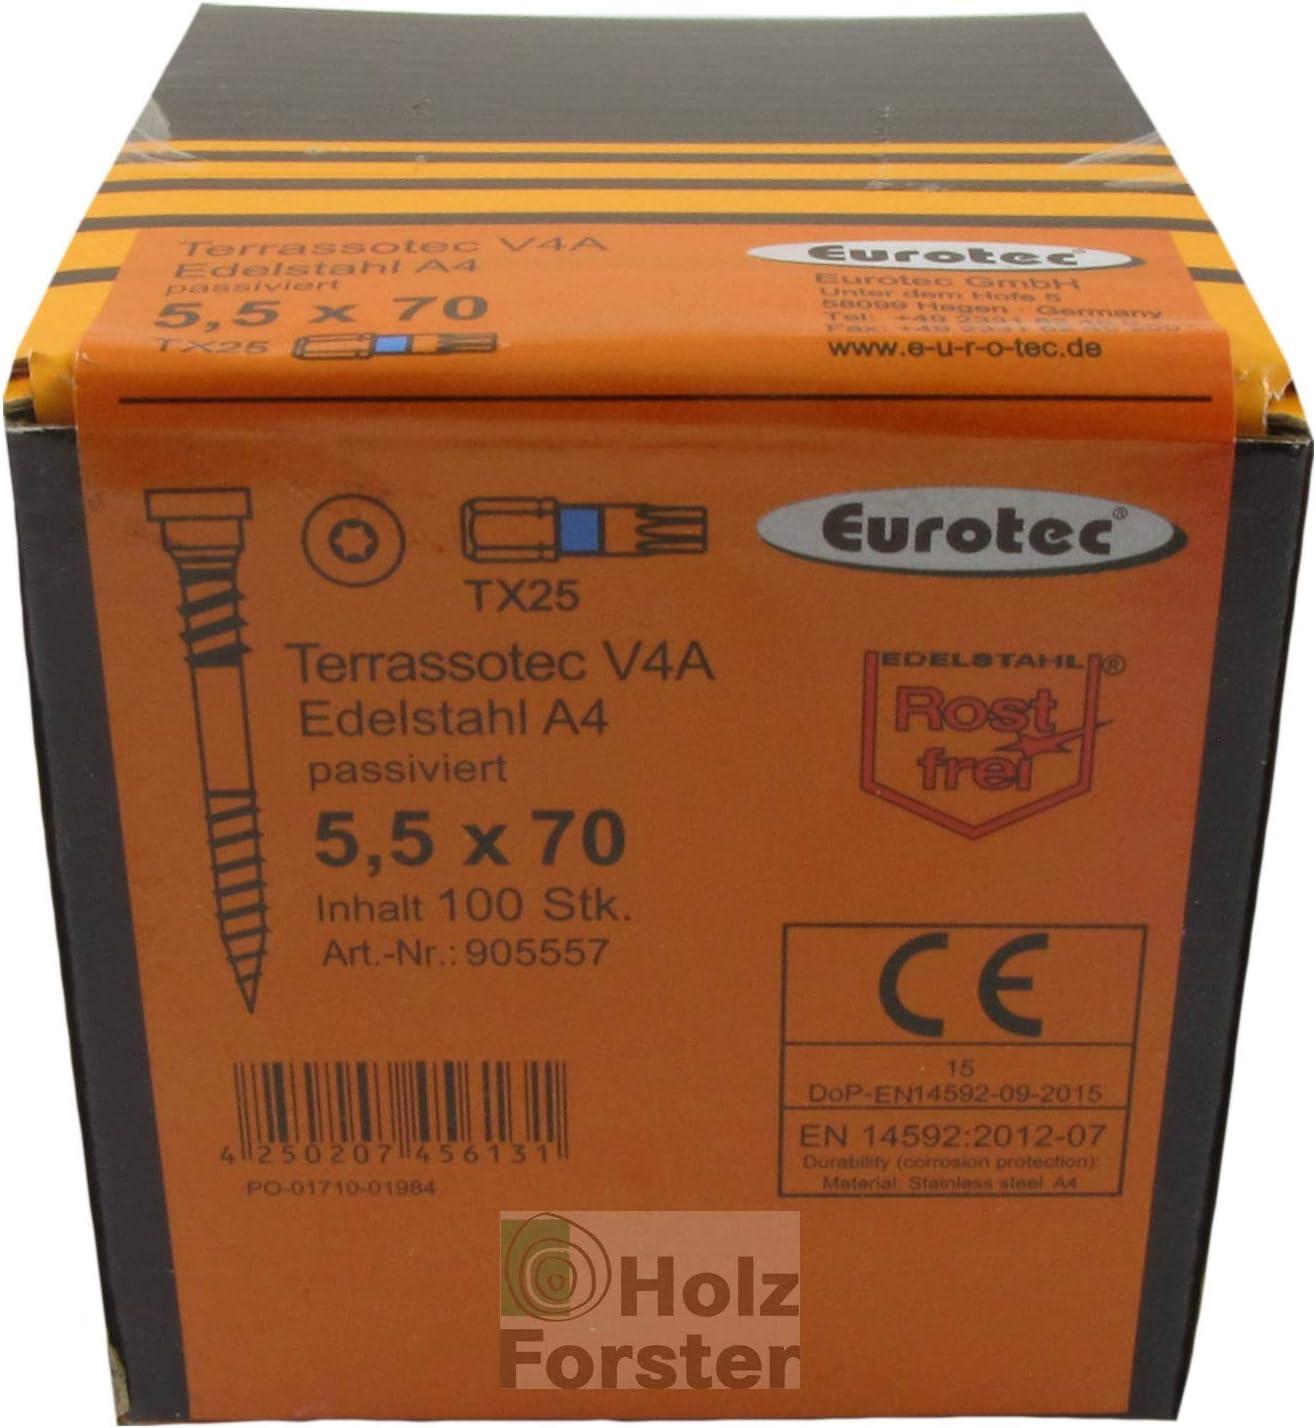 EUROTEC Terrassotec Trilobular V4A 5,5x90mm 100 St/ück